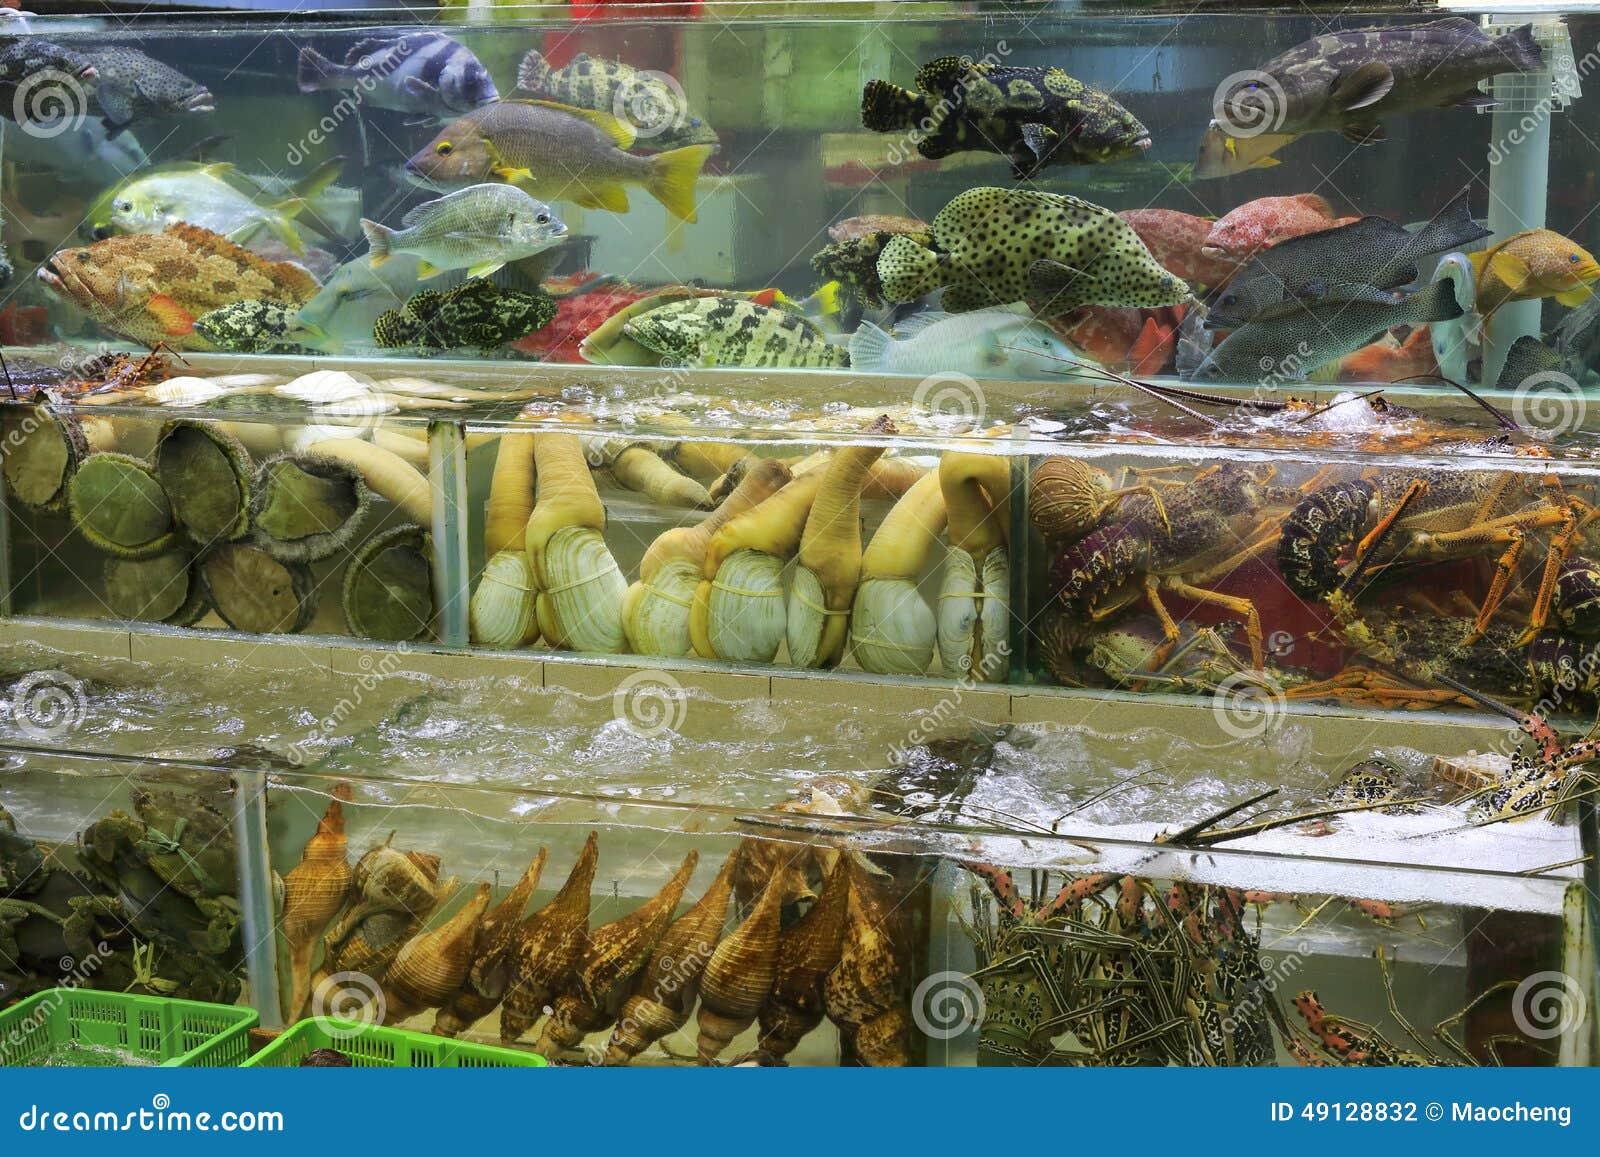 Fish Tanks Of Seafood Restaurant Stock Photo - Image: 49128832